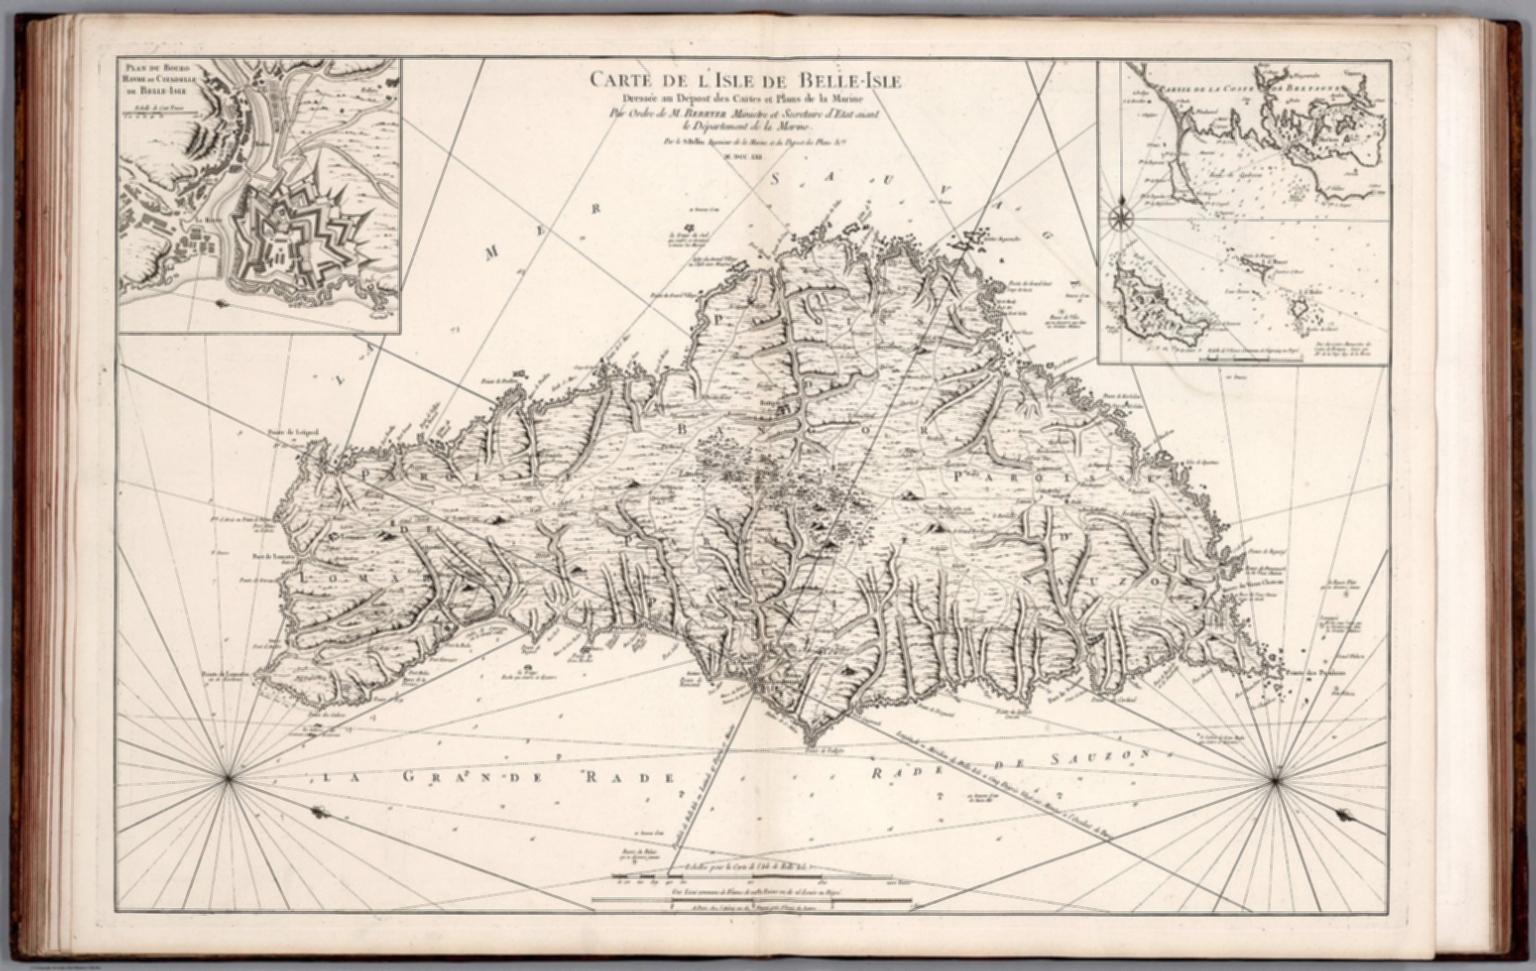 Carte De Lasie Test.Carte De L Isle De Belle Isle David Rumsey Historical Map